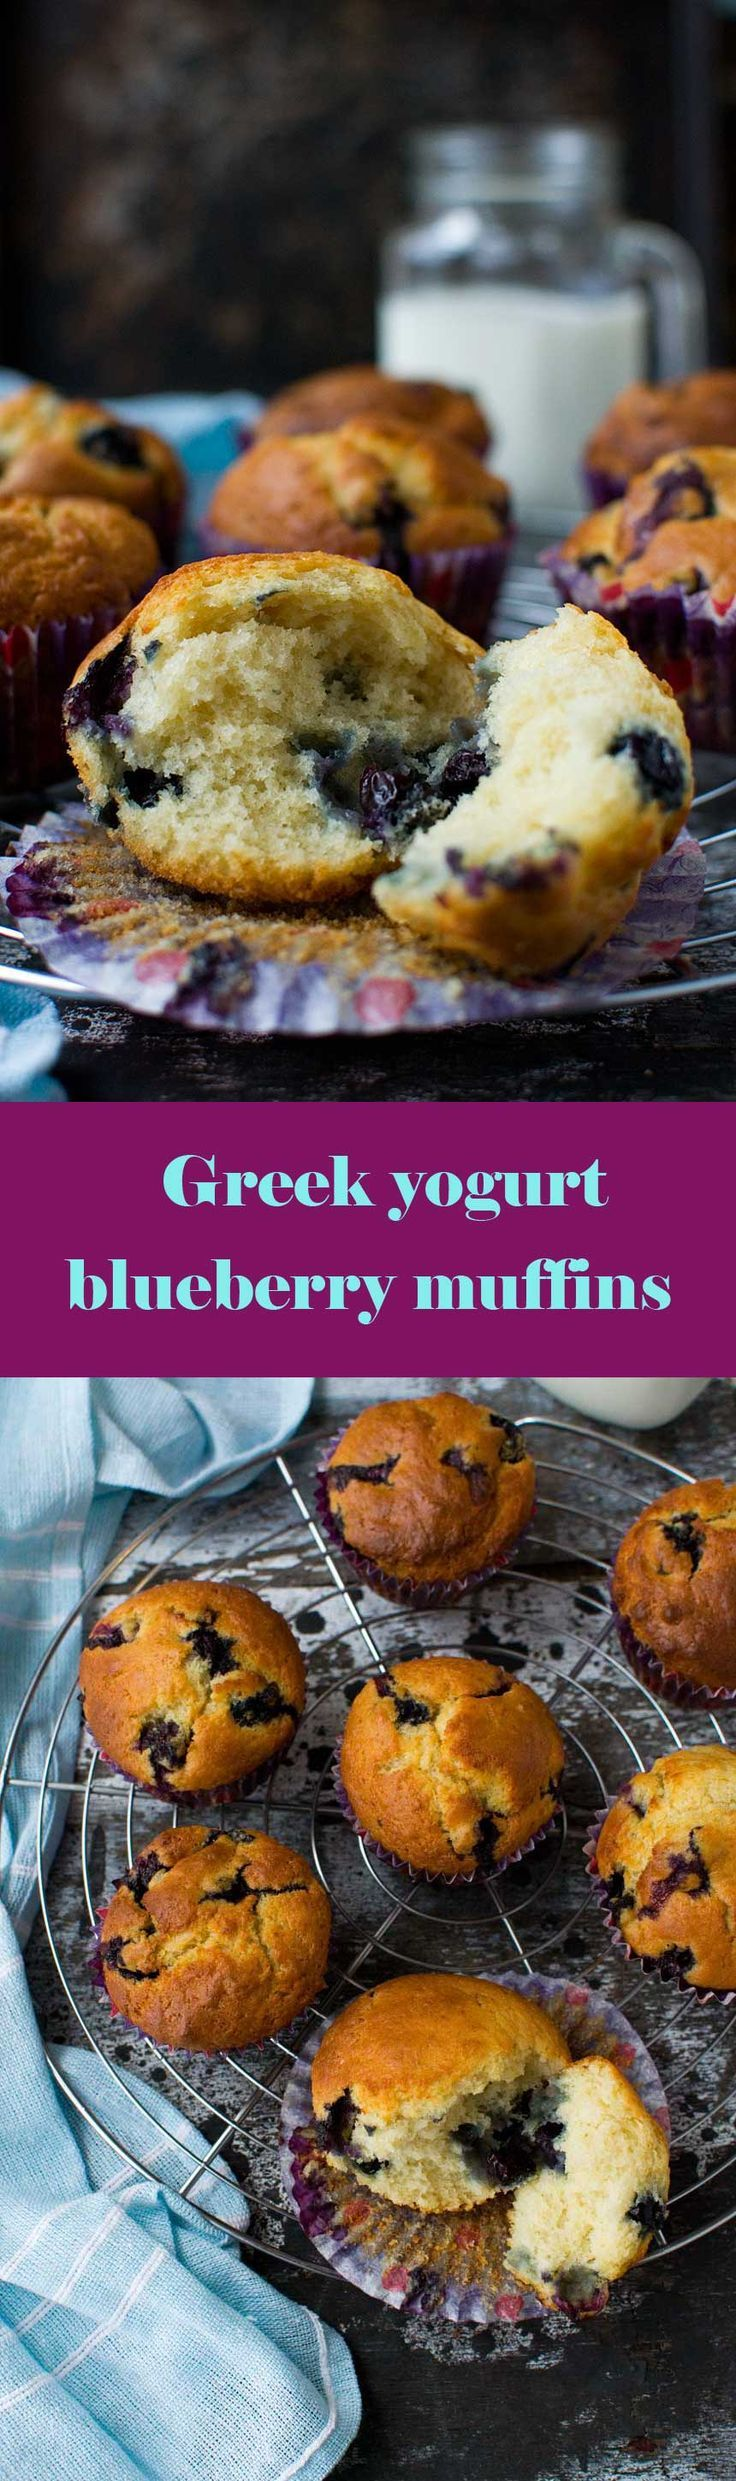 diät muffins kalorienarm